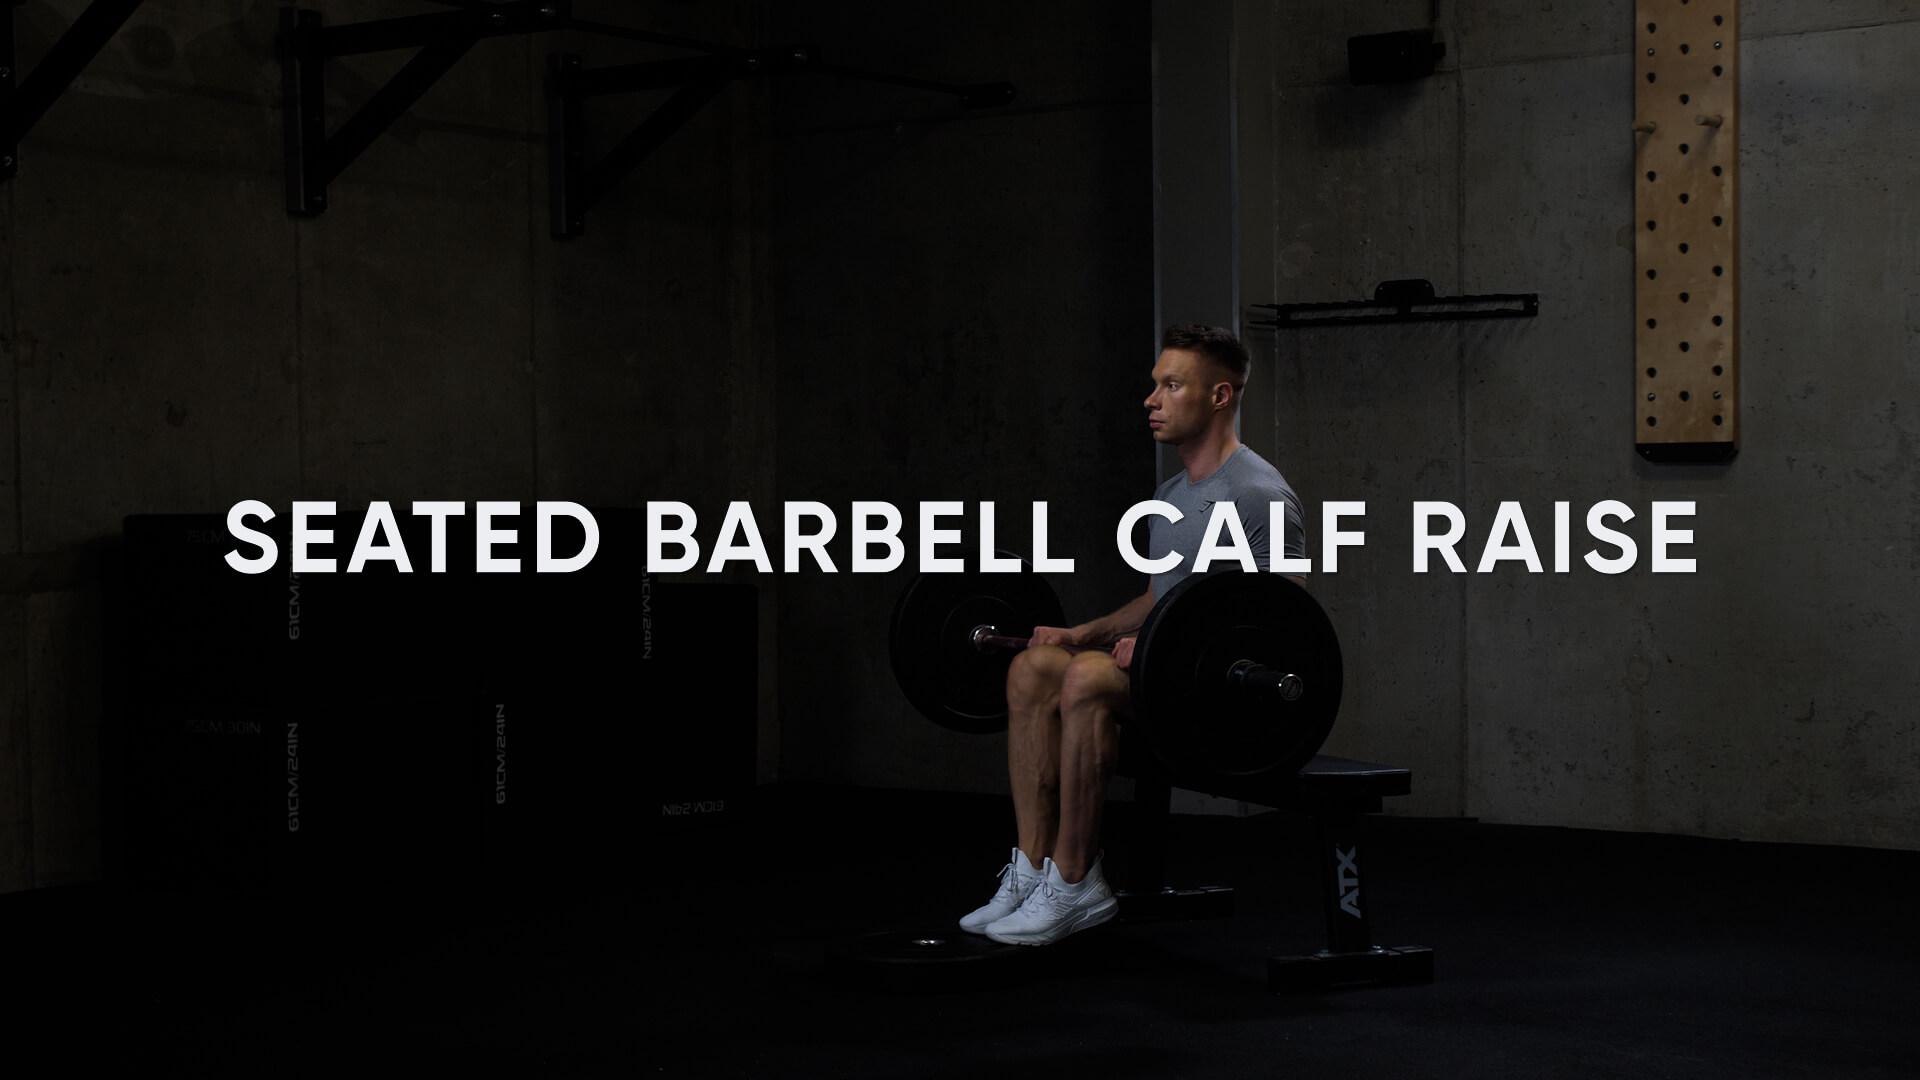 Seated Barbell Calf Raise